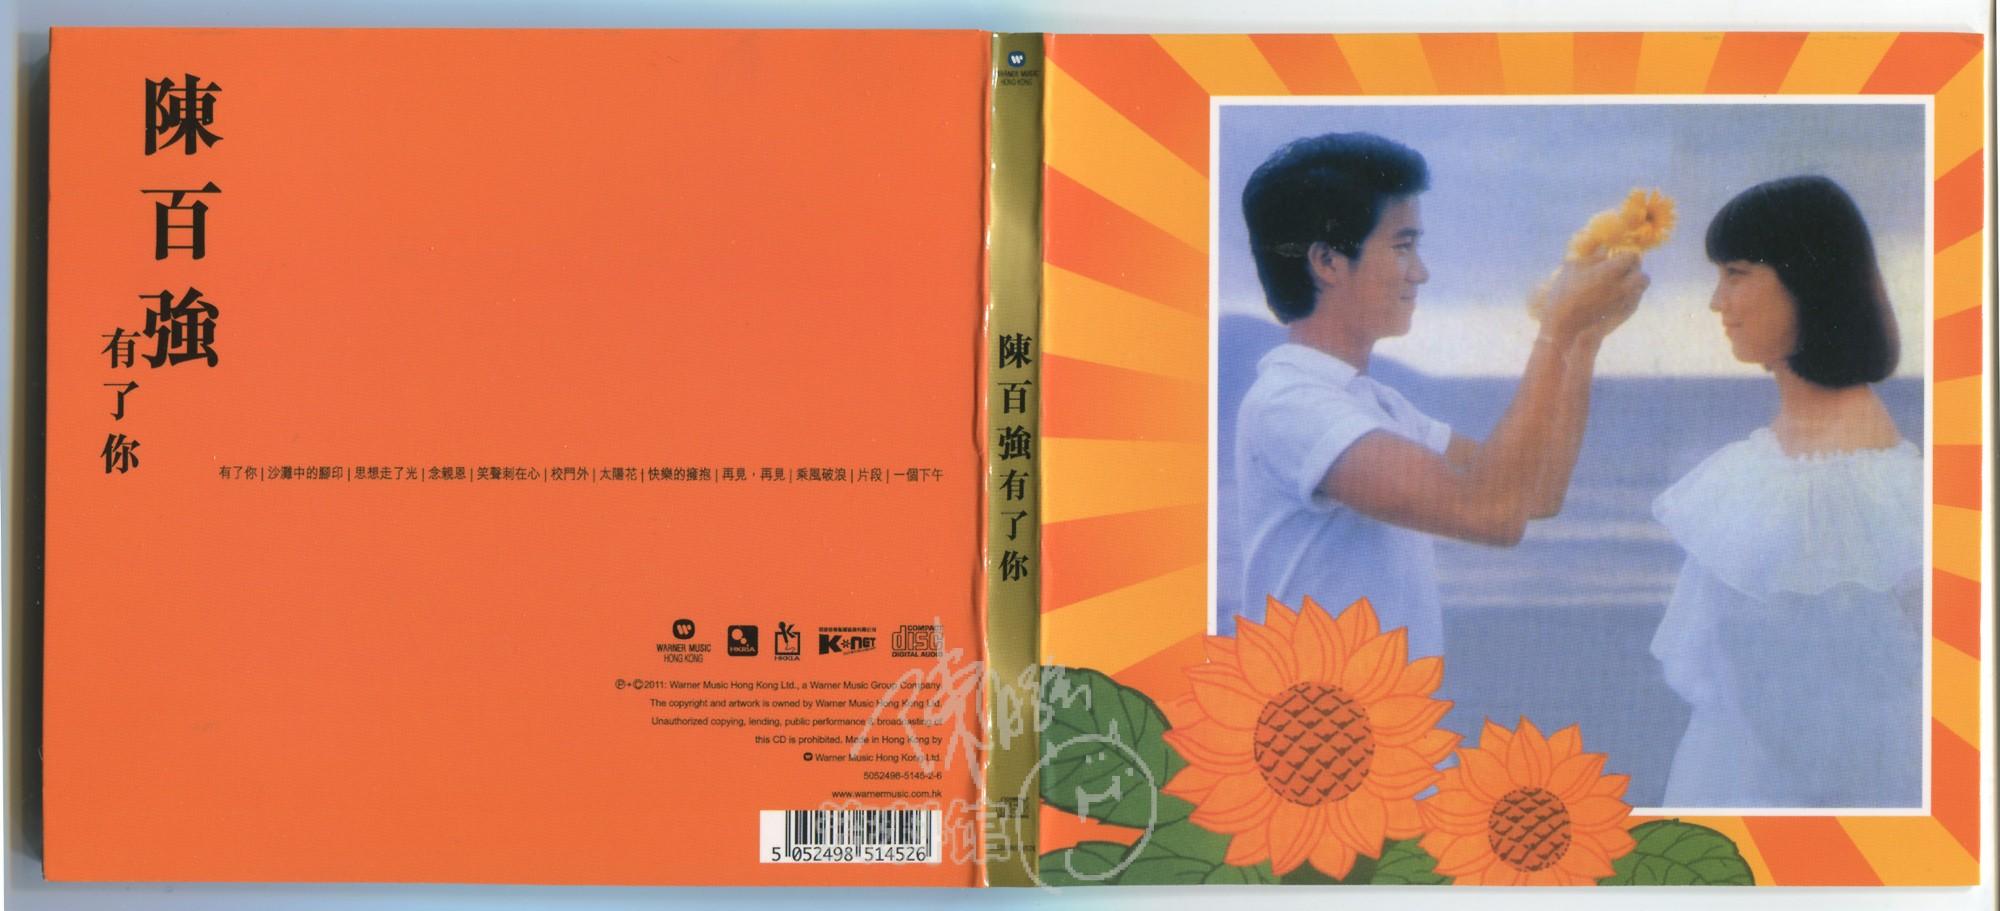 cd碟花了_2011.08.23 华纳+EMI 金复刻 有了你   陈百强资料馆CN